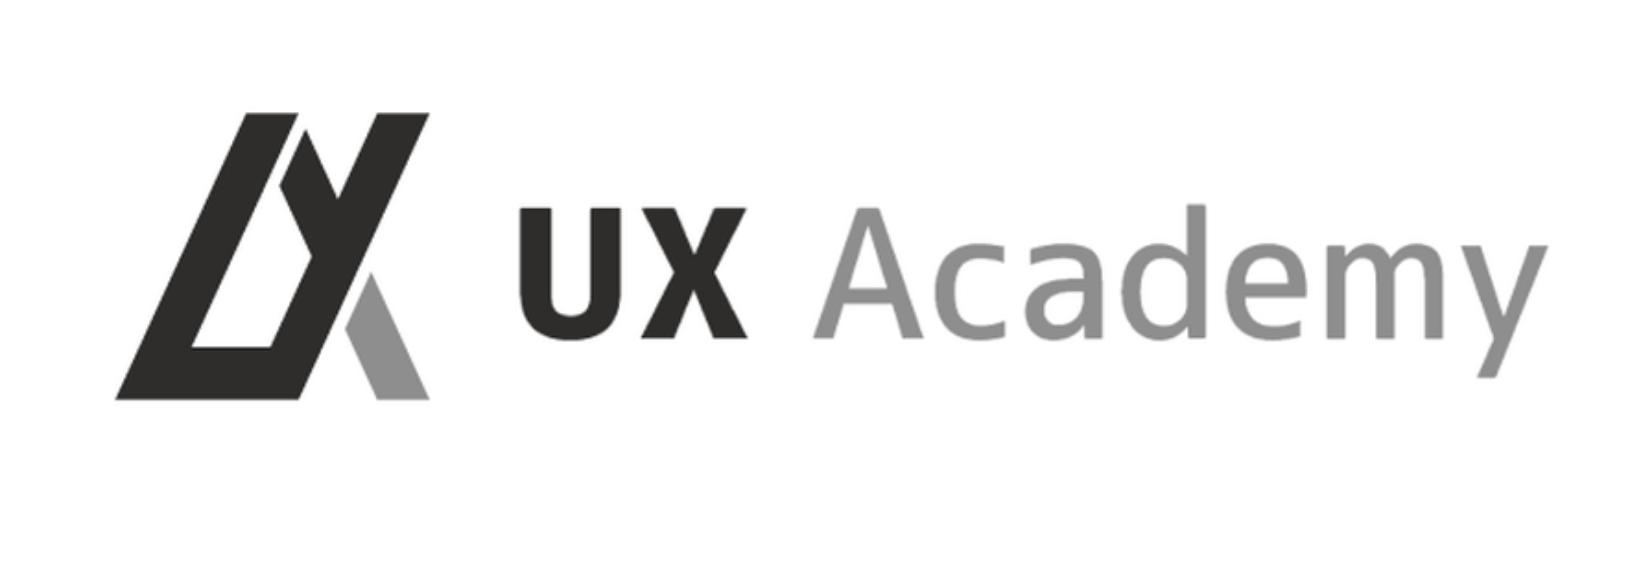 UX Academy ロゴ